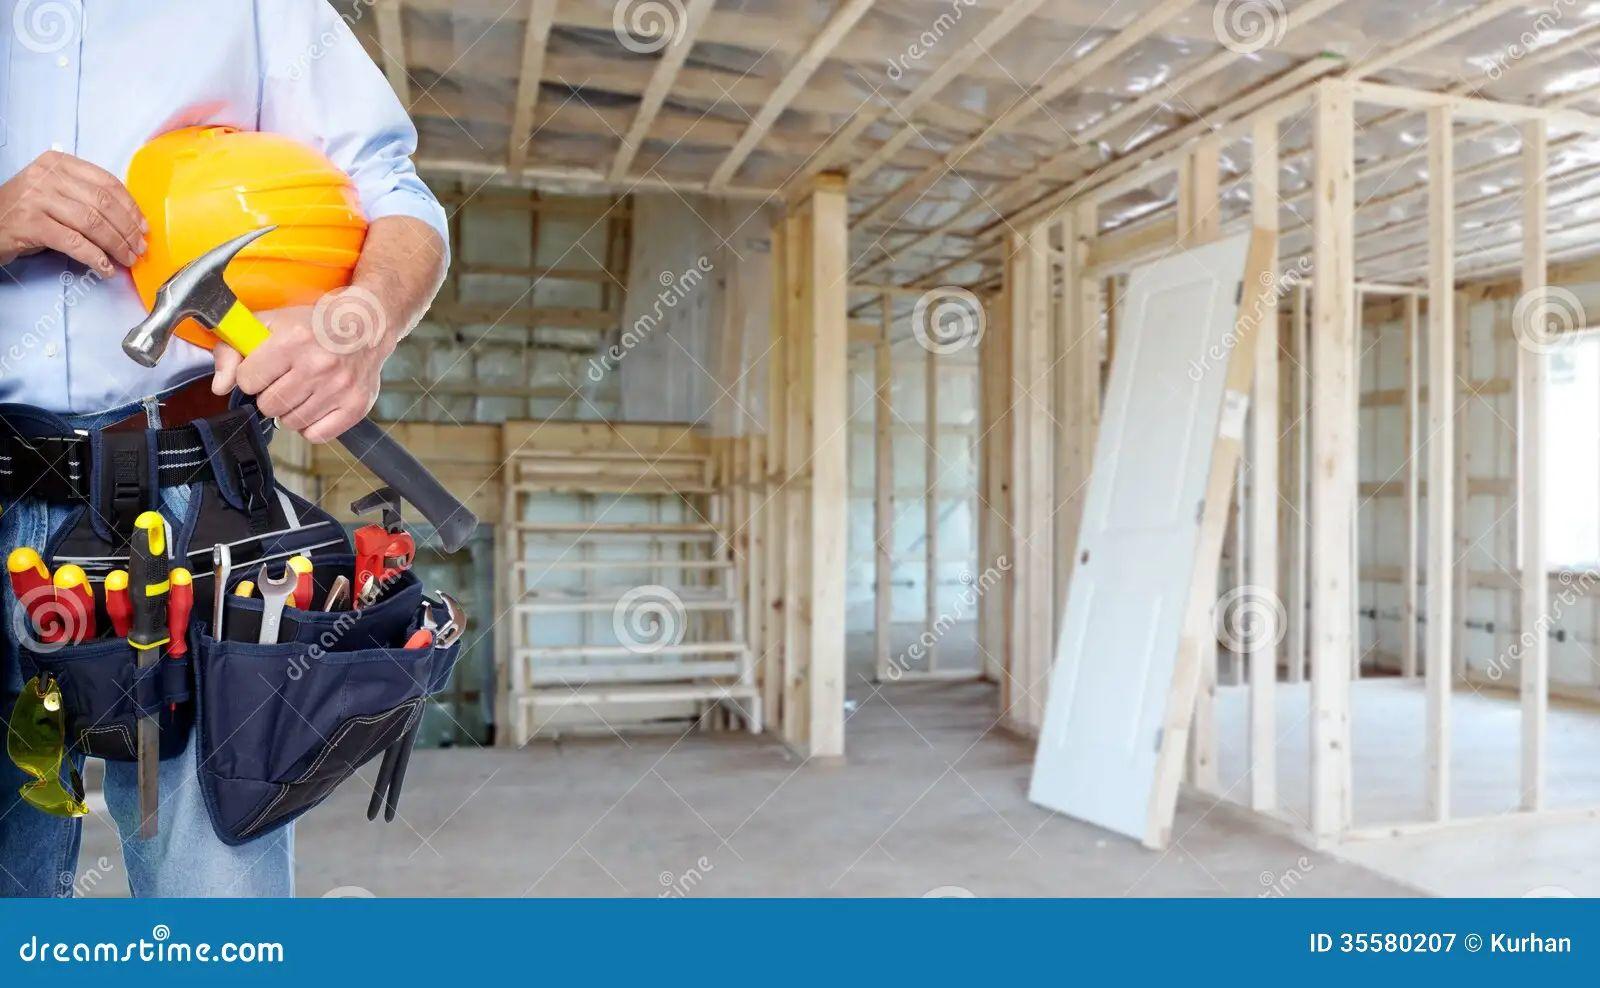 handyman images free